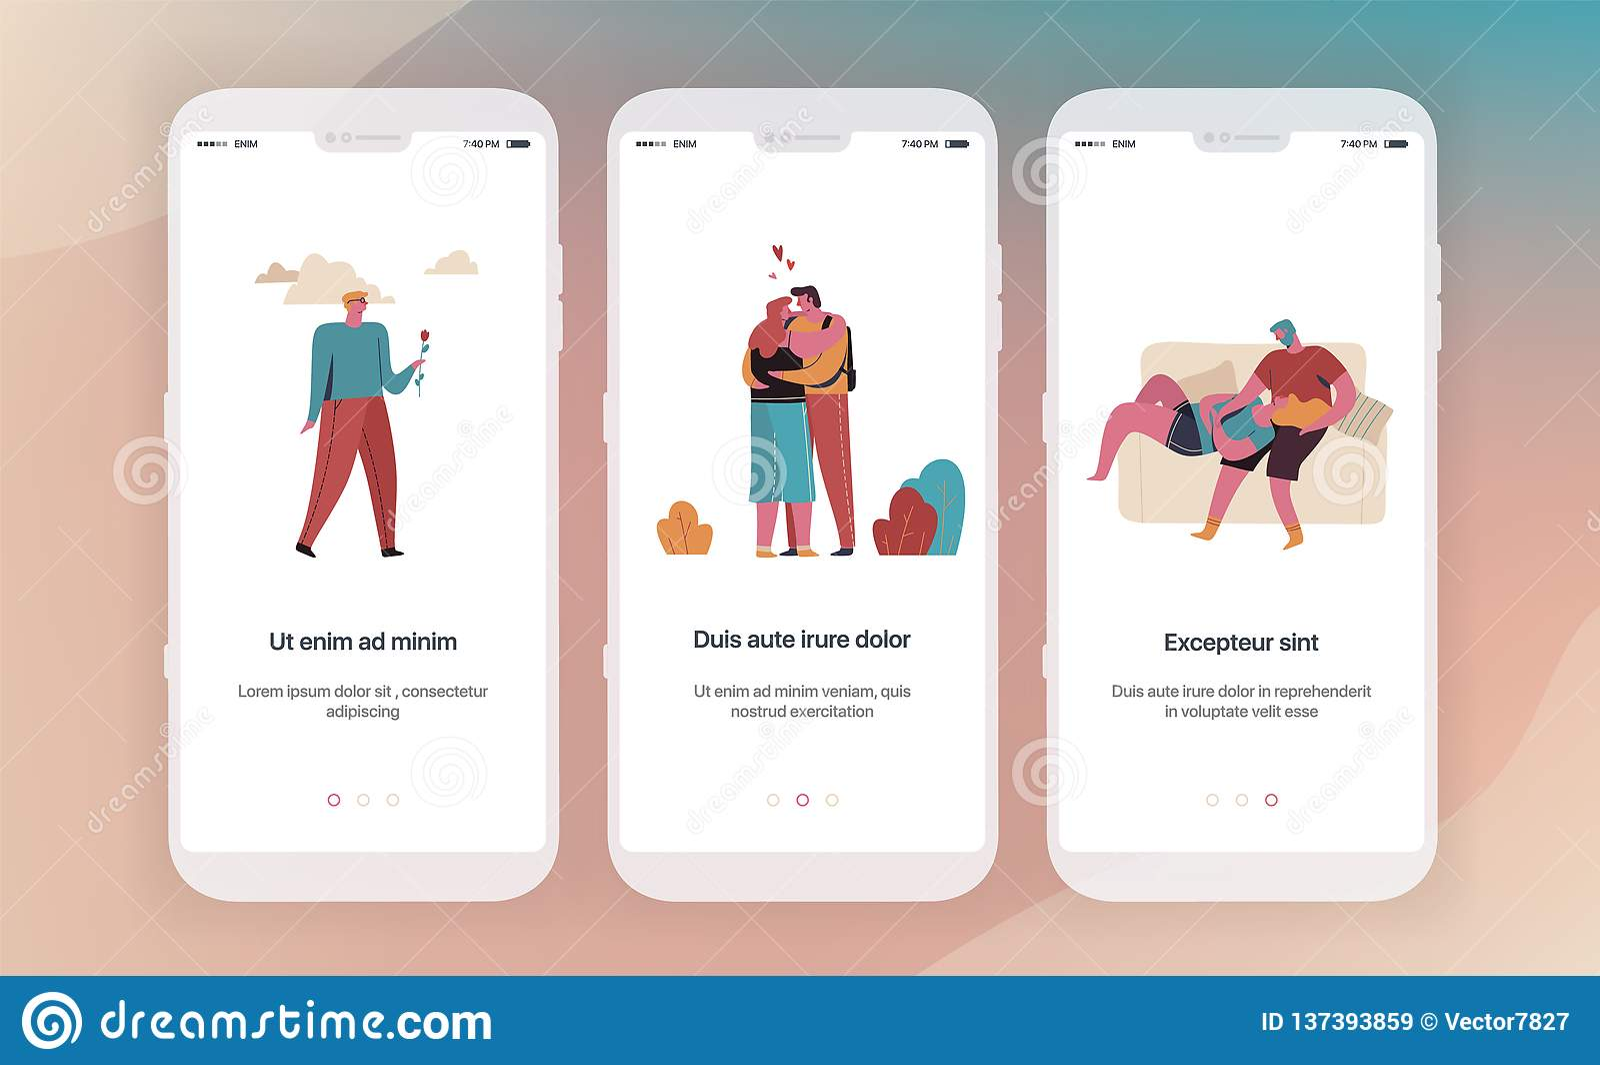 icelandic dating websites